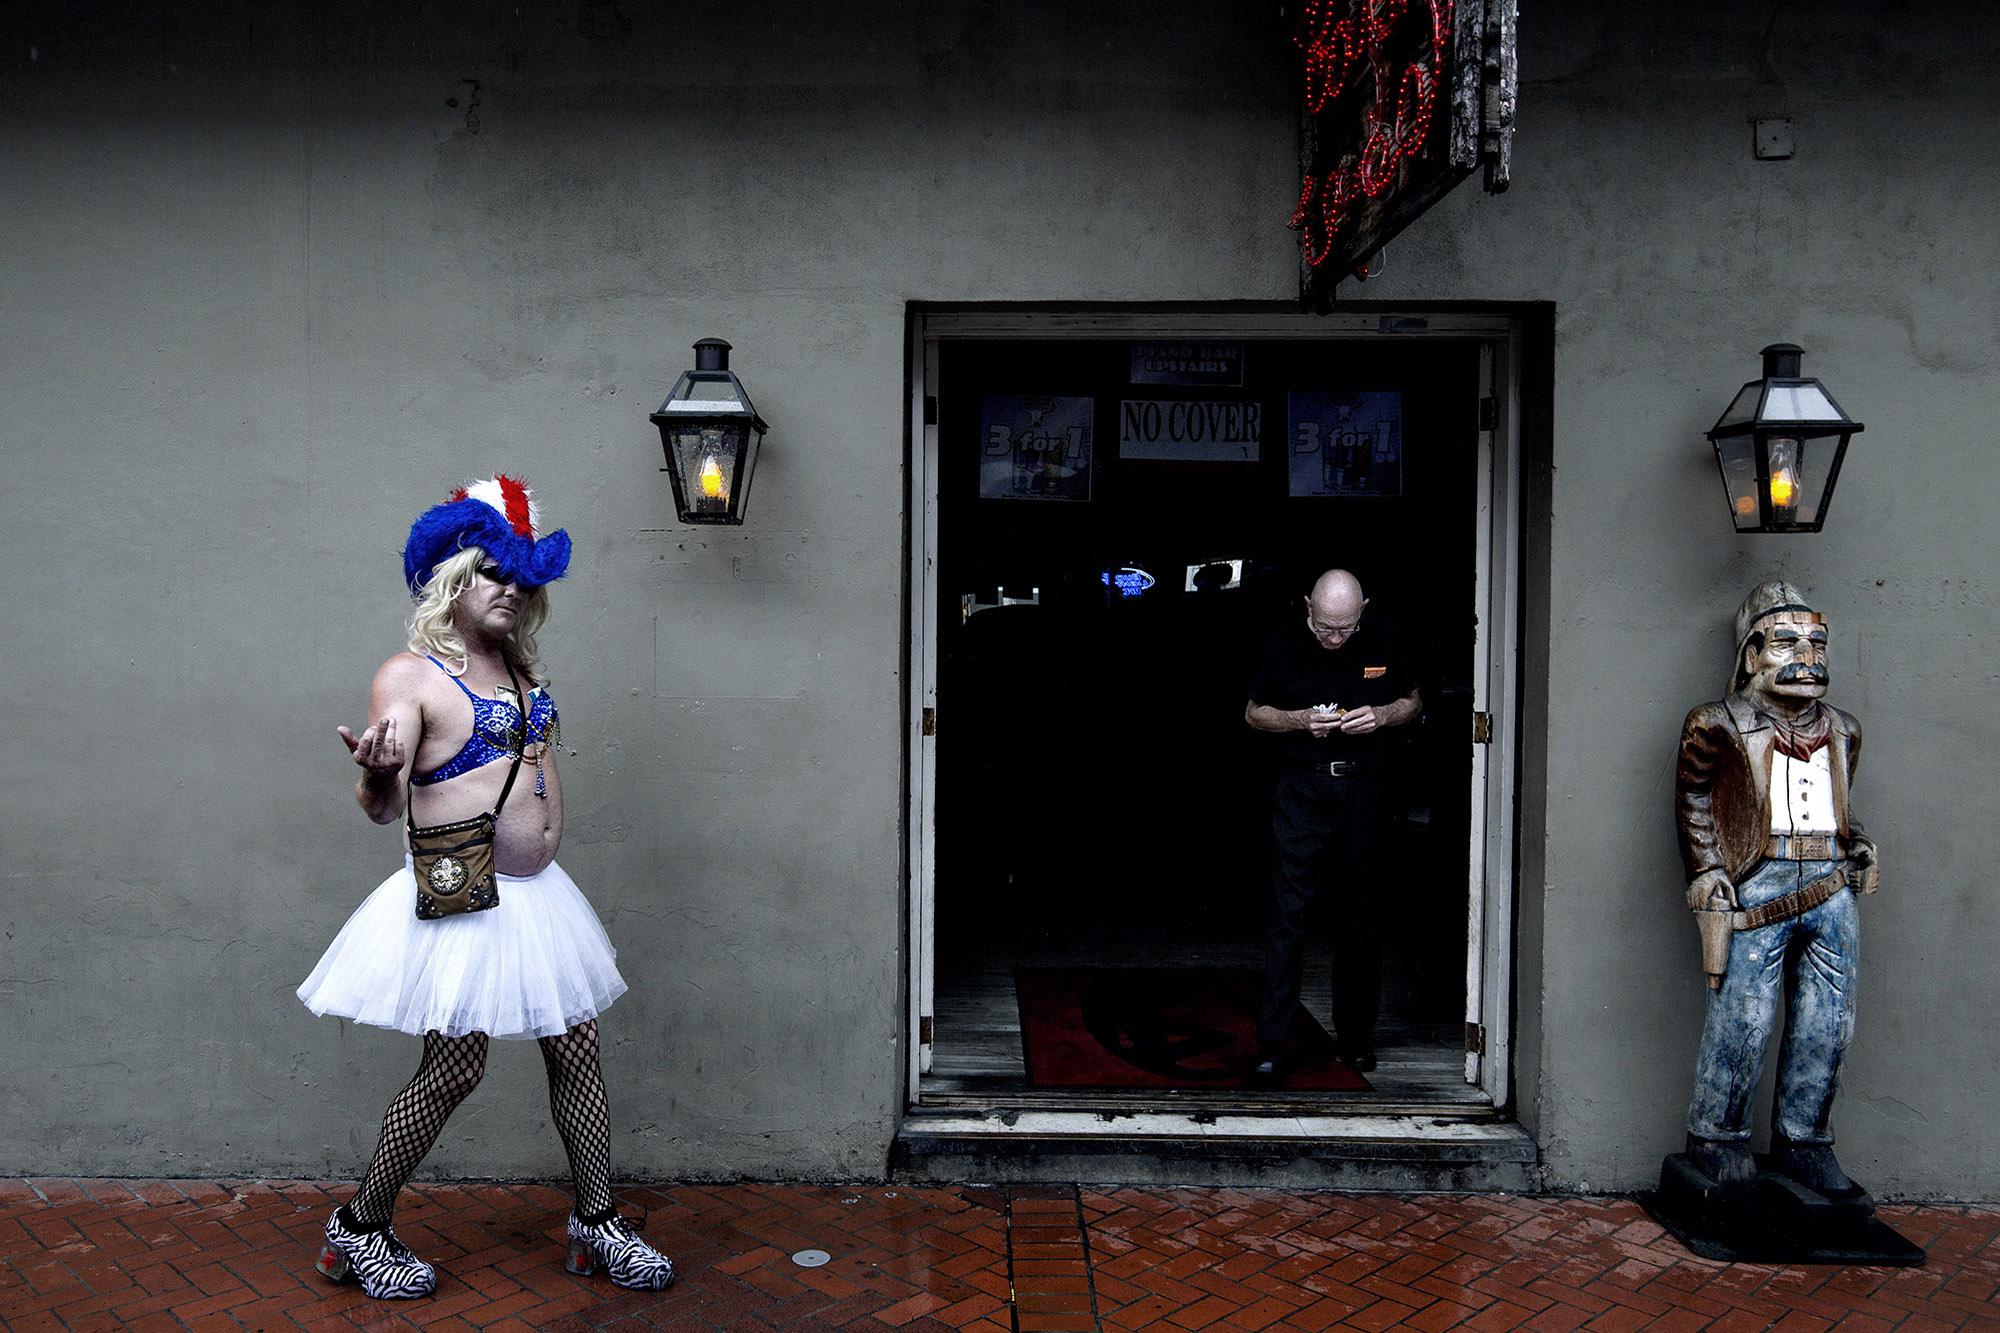 Bourbon Street:Tourism is now back to pre-Katrina levels.